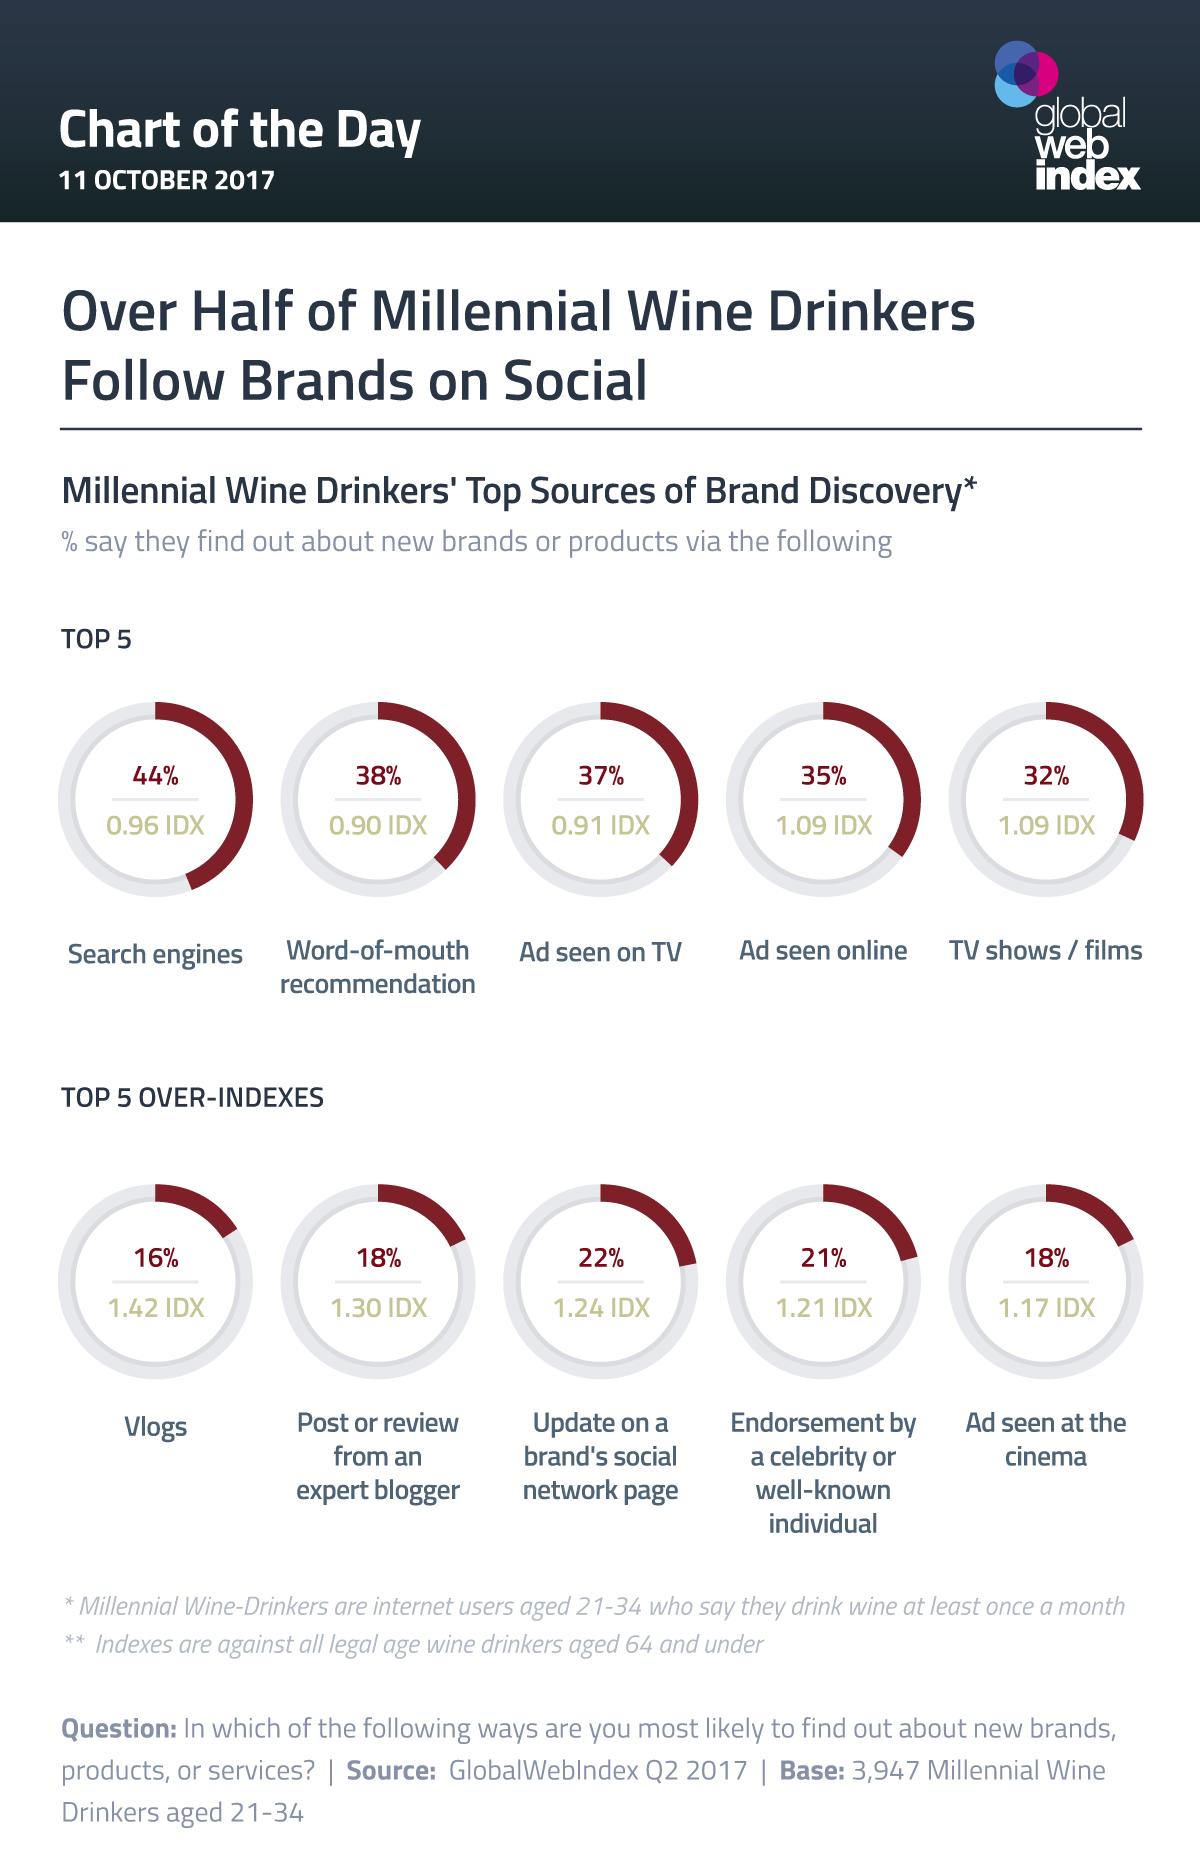 Over Half of Millennial Wine Drinkers Follow Brands on Social